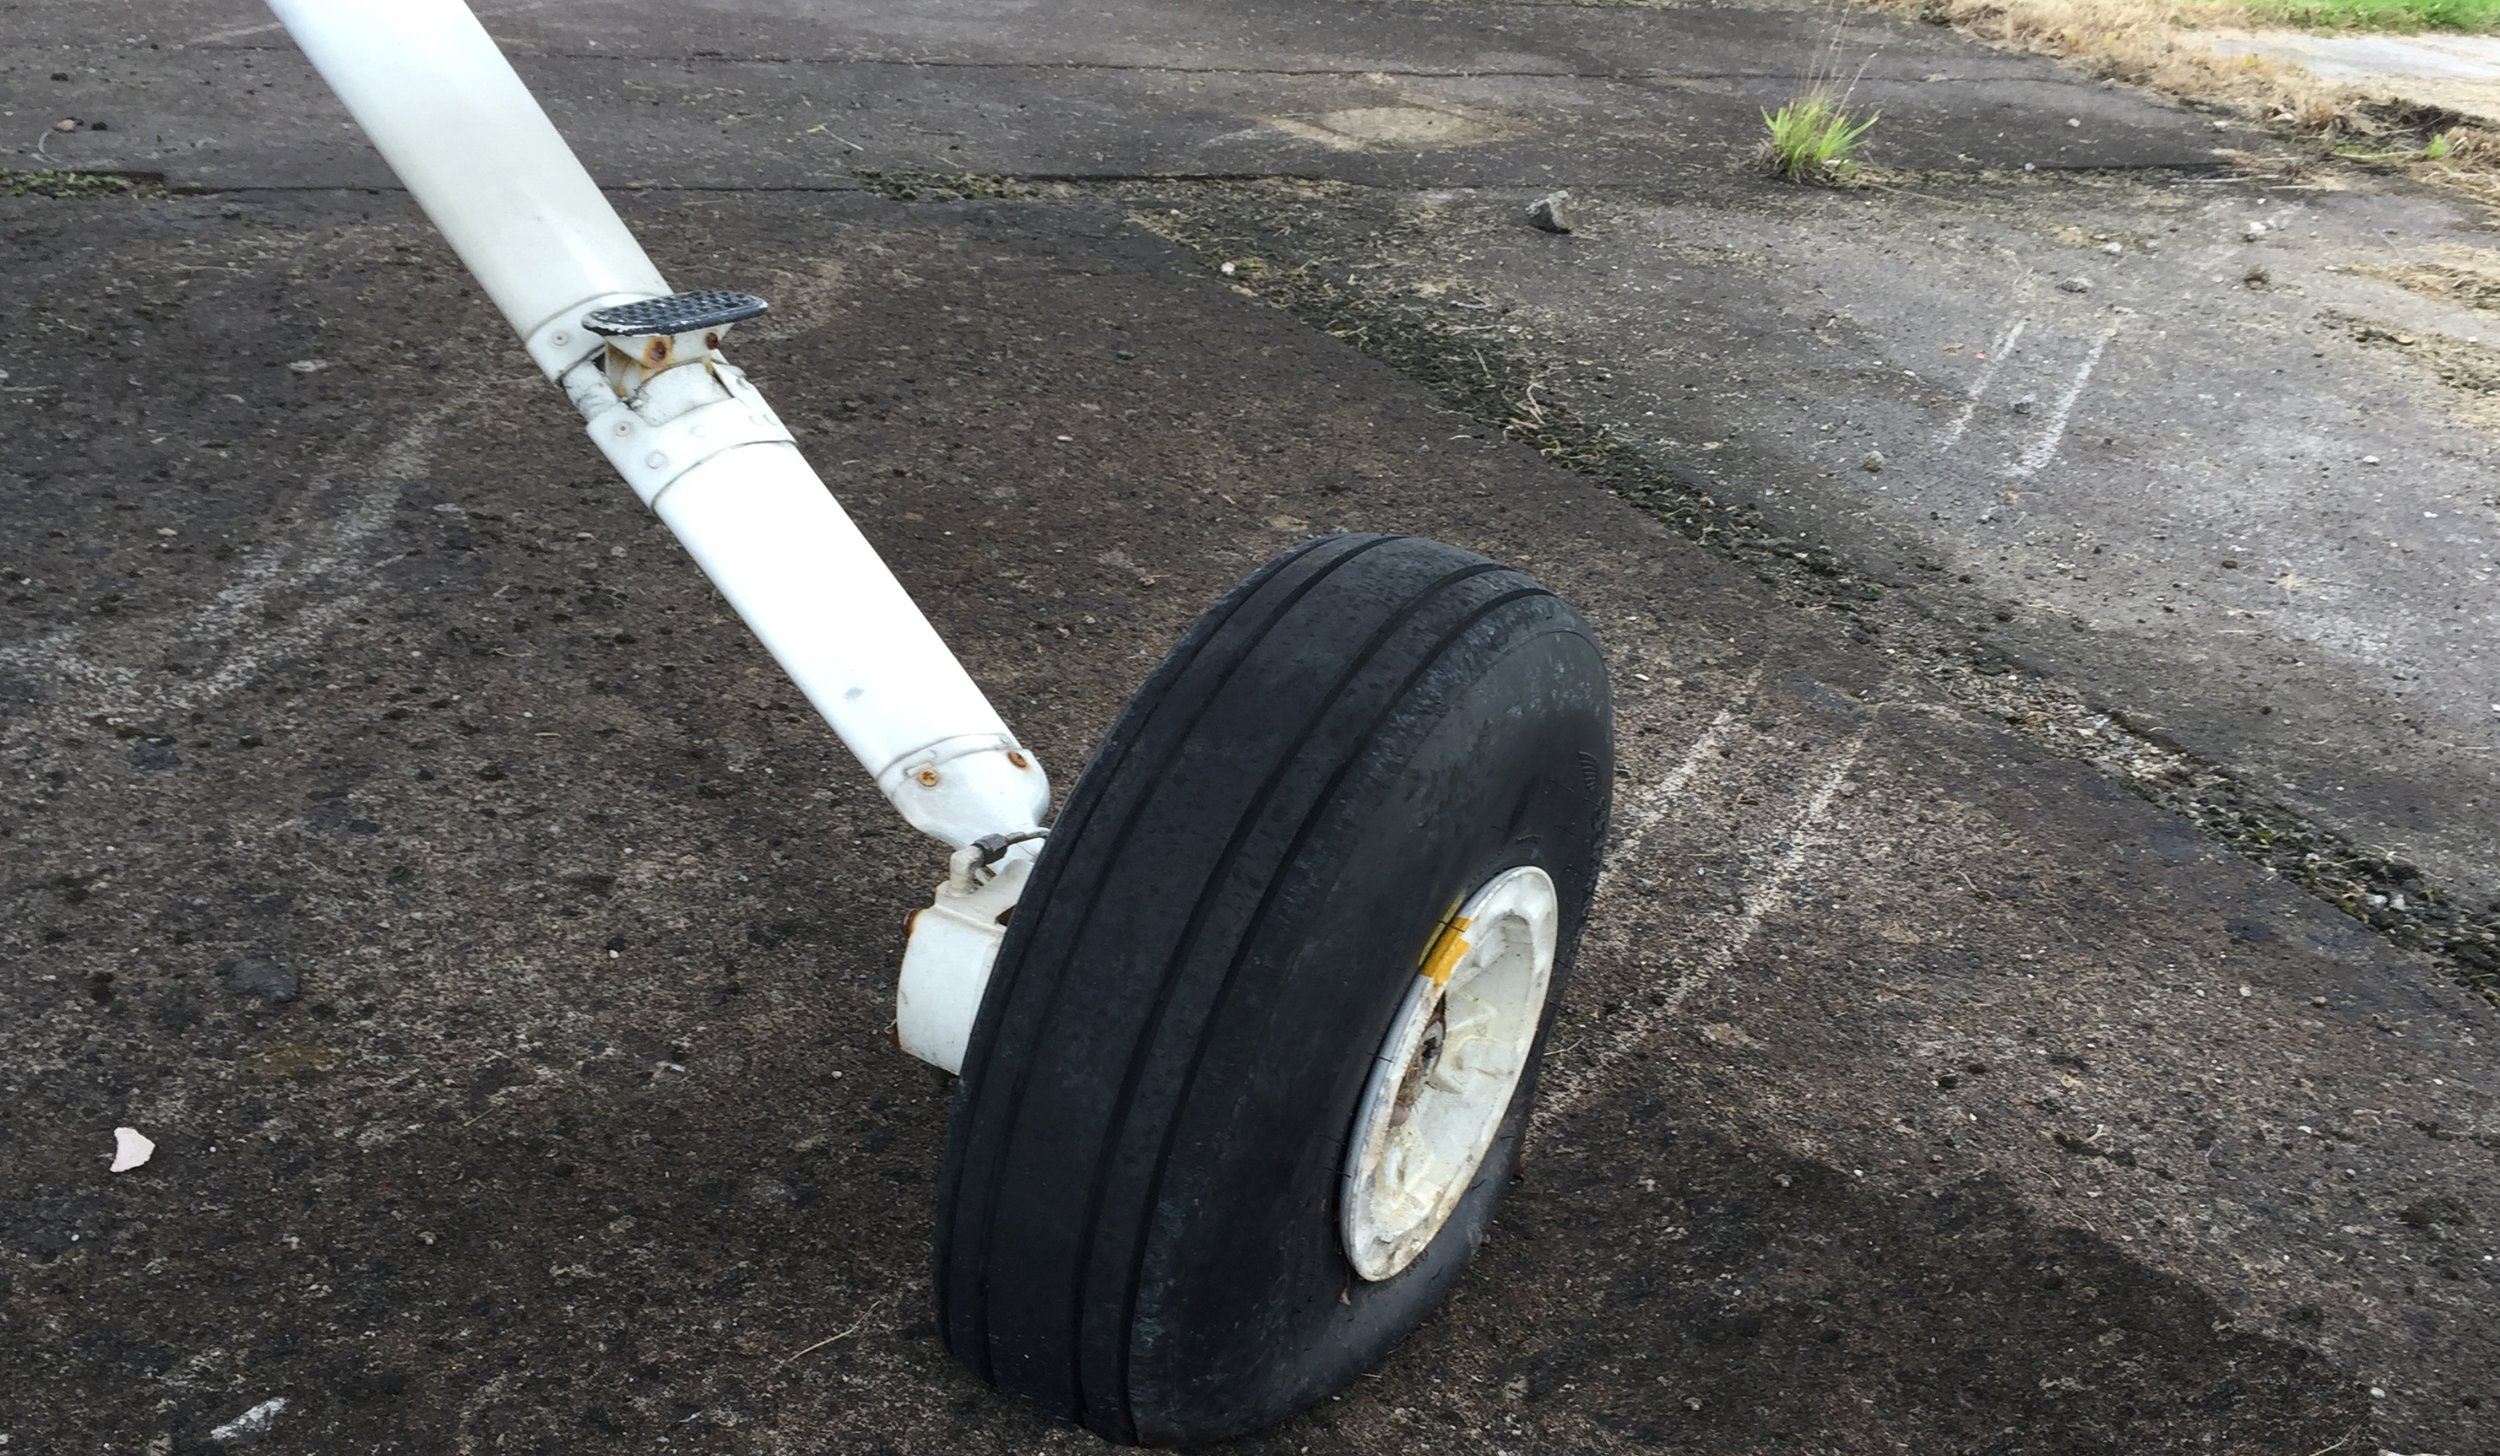 Runway Excursion Gear and Prop Damage: GA Aircraft